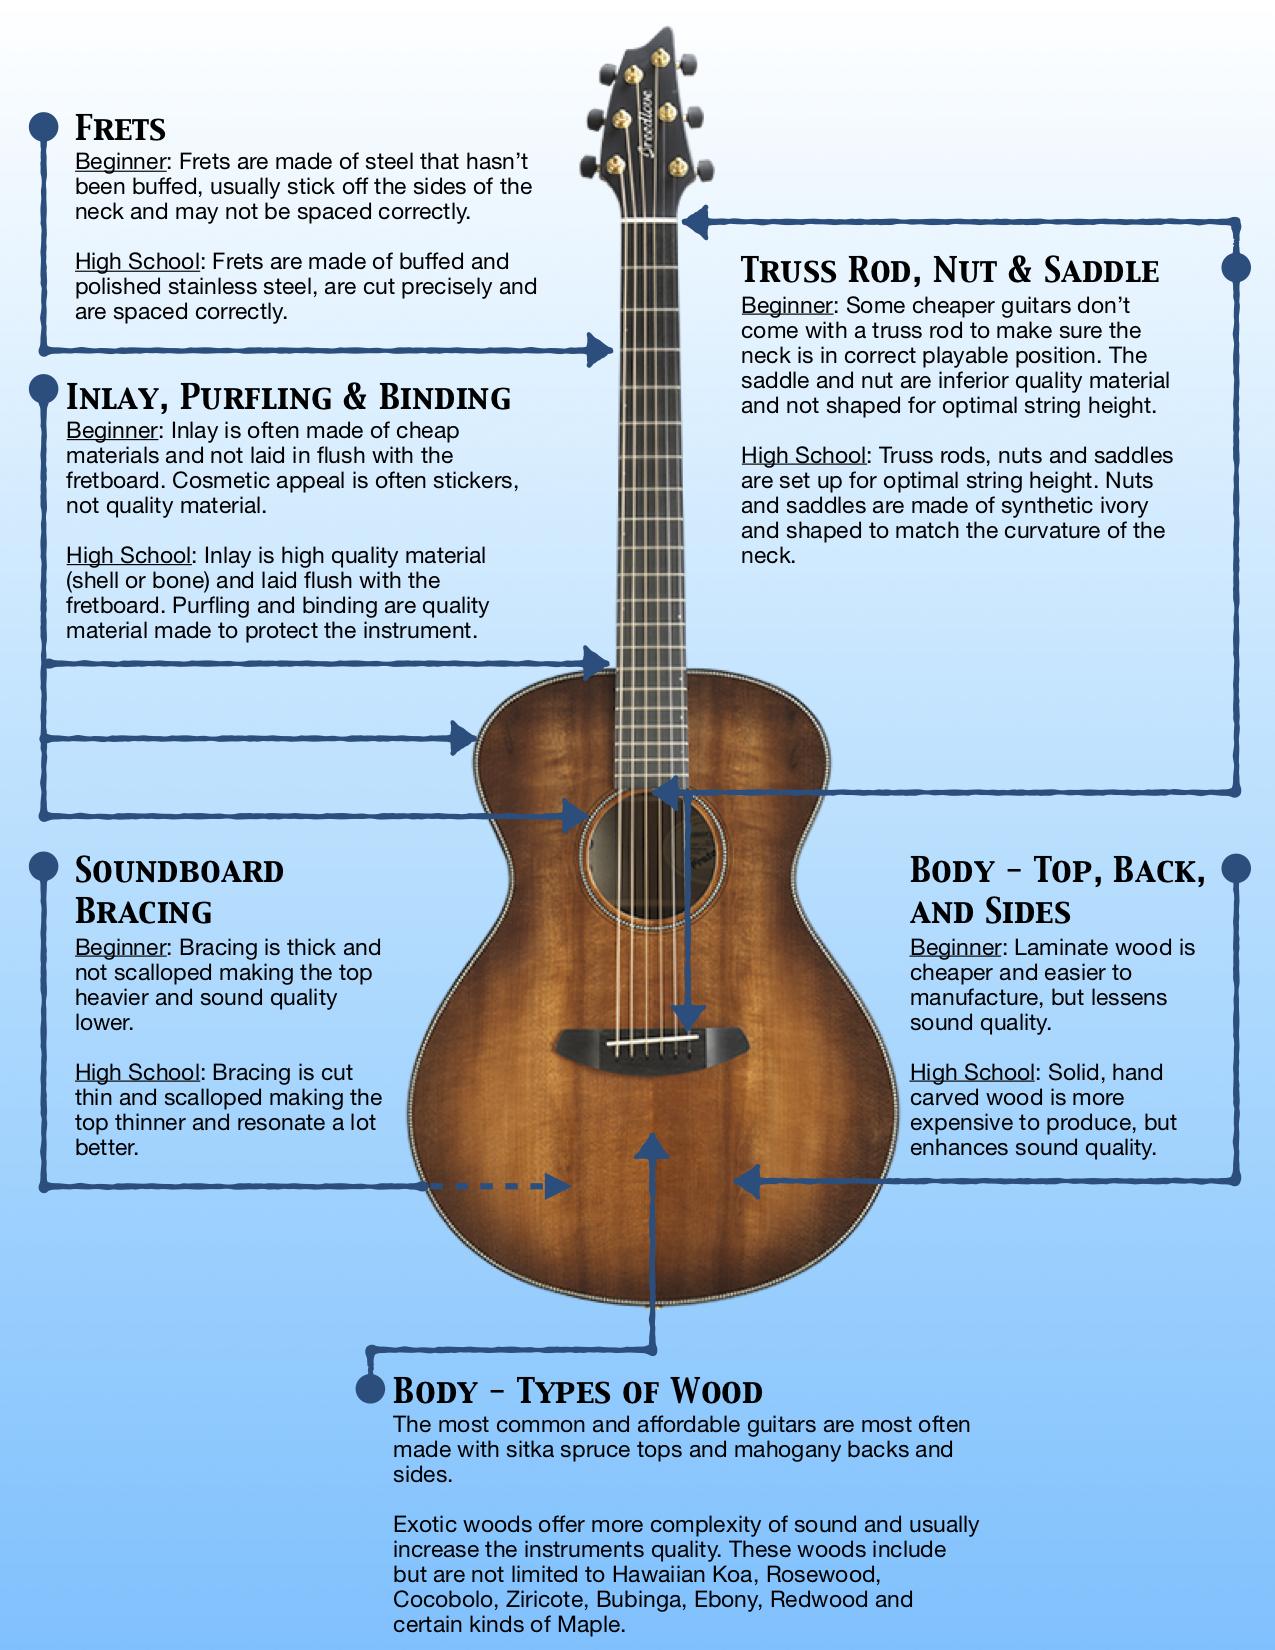 Guitar One Sheet jpeg.jpg